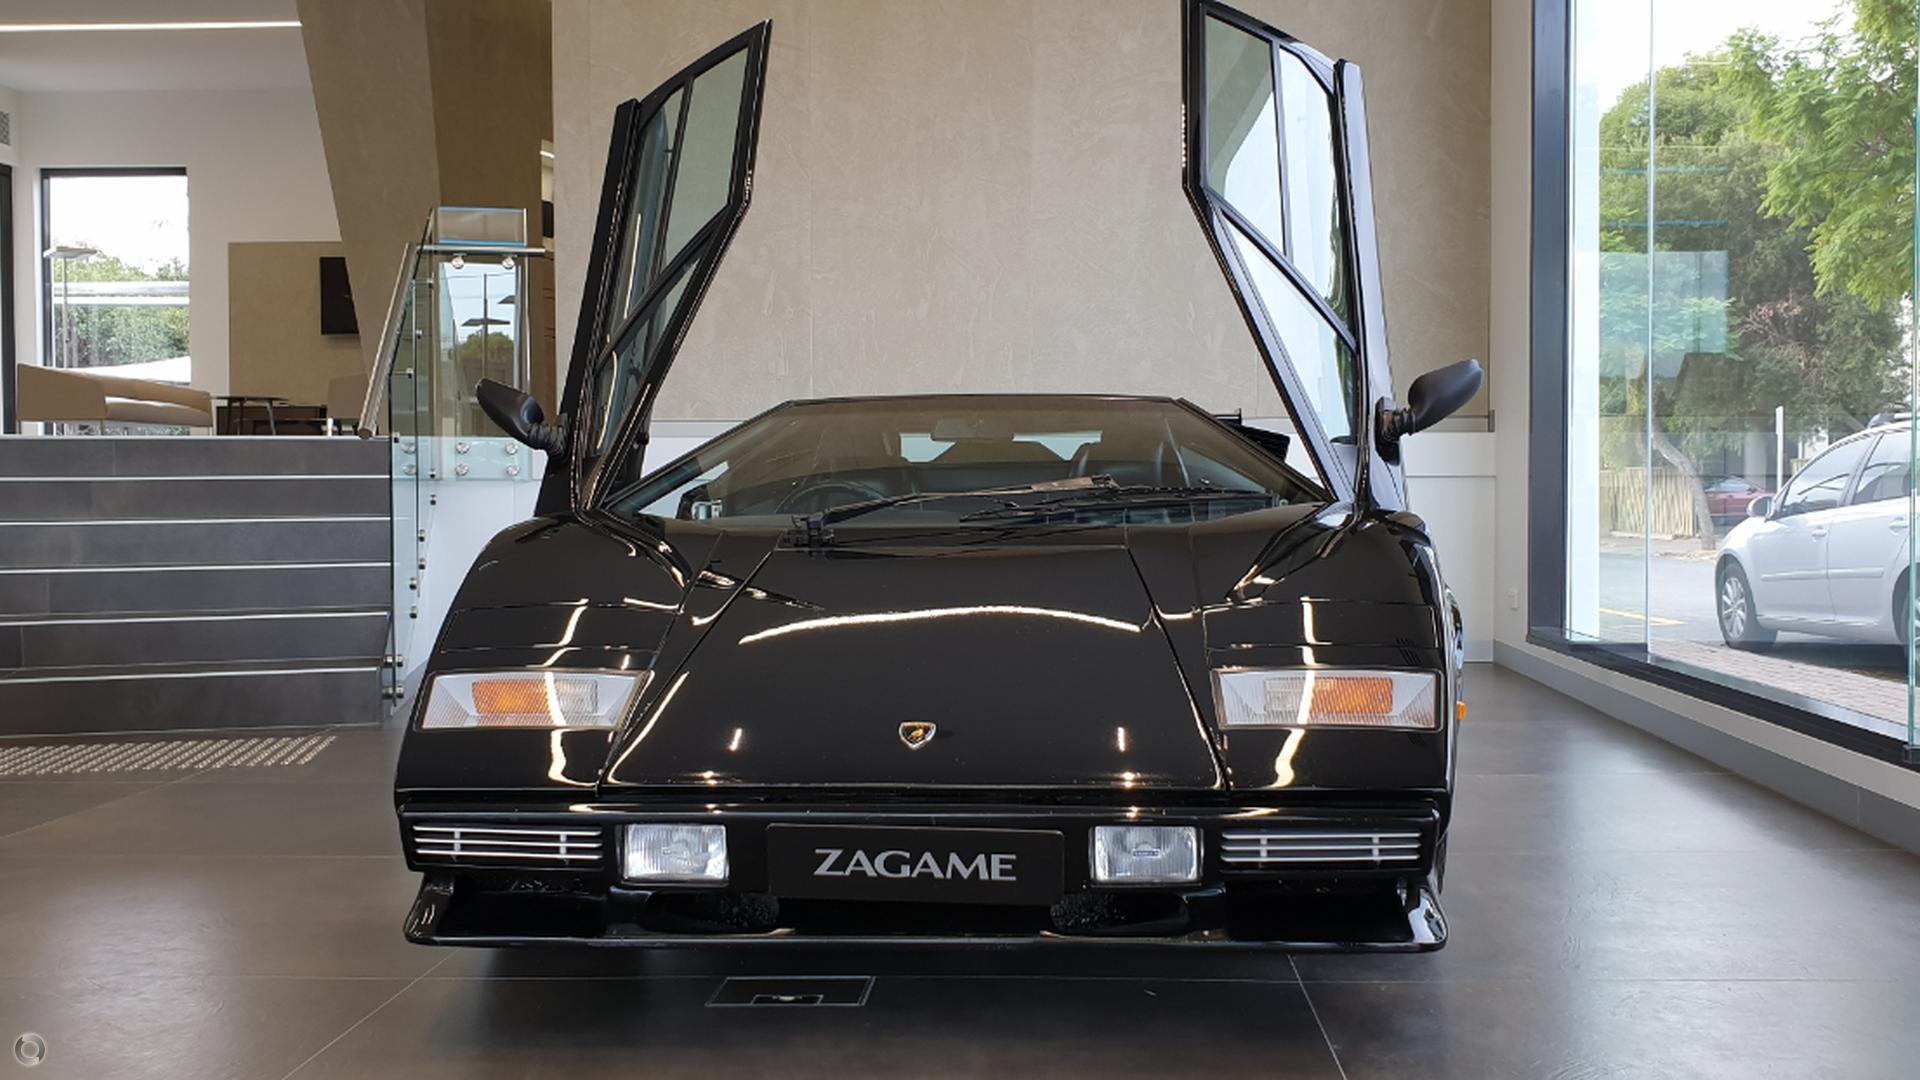 1985 Lamborghini Countach 5000 quattrovalvole LP112D